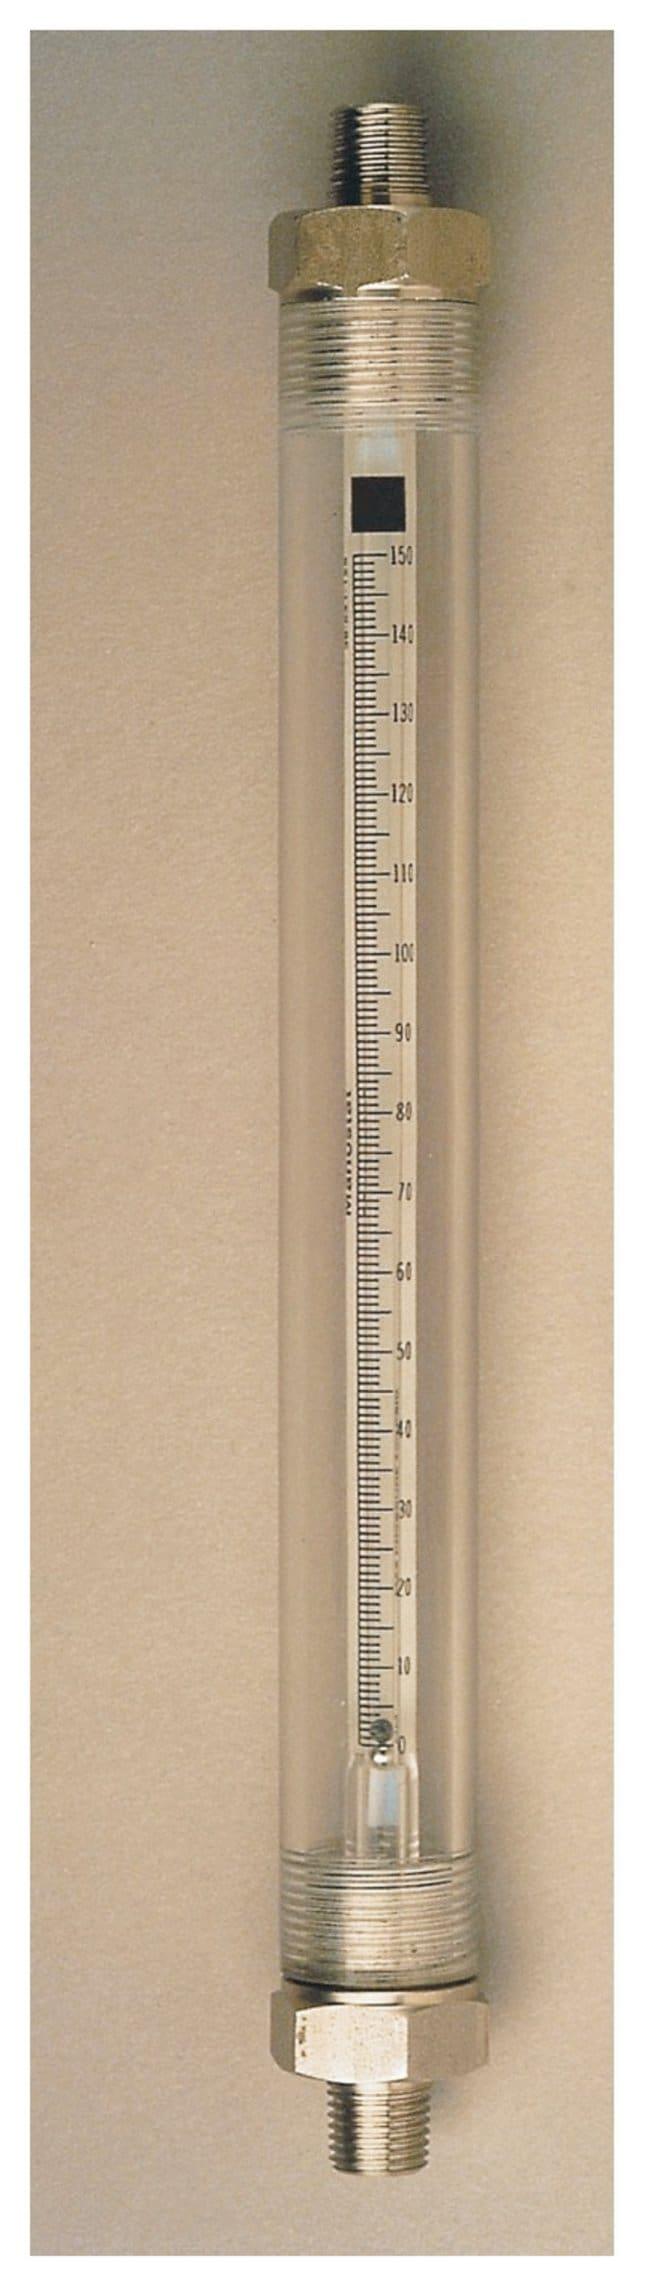 Bel-ArtSP Scienceware RITEFLOW Guarded Complete Flowmeters, 150mm Scale